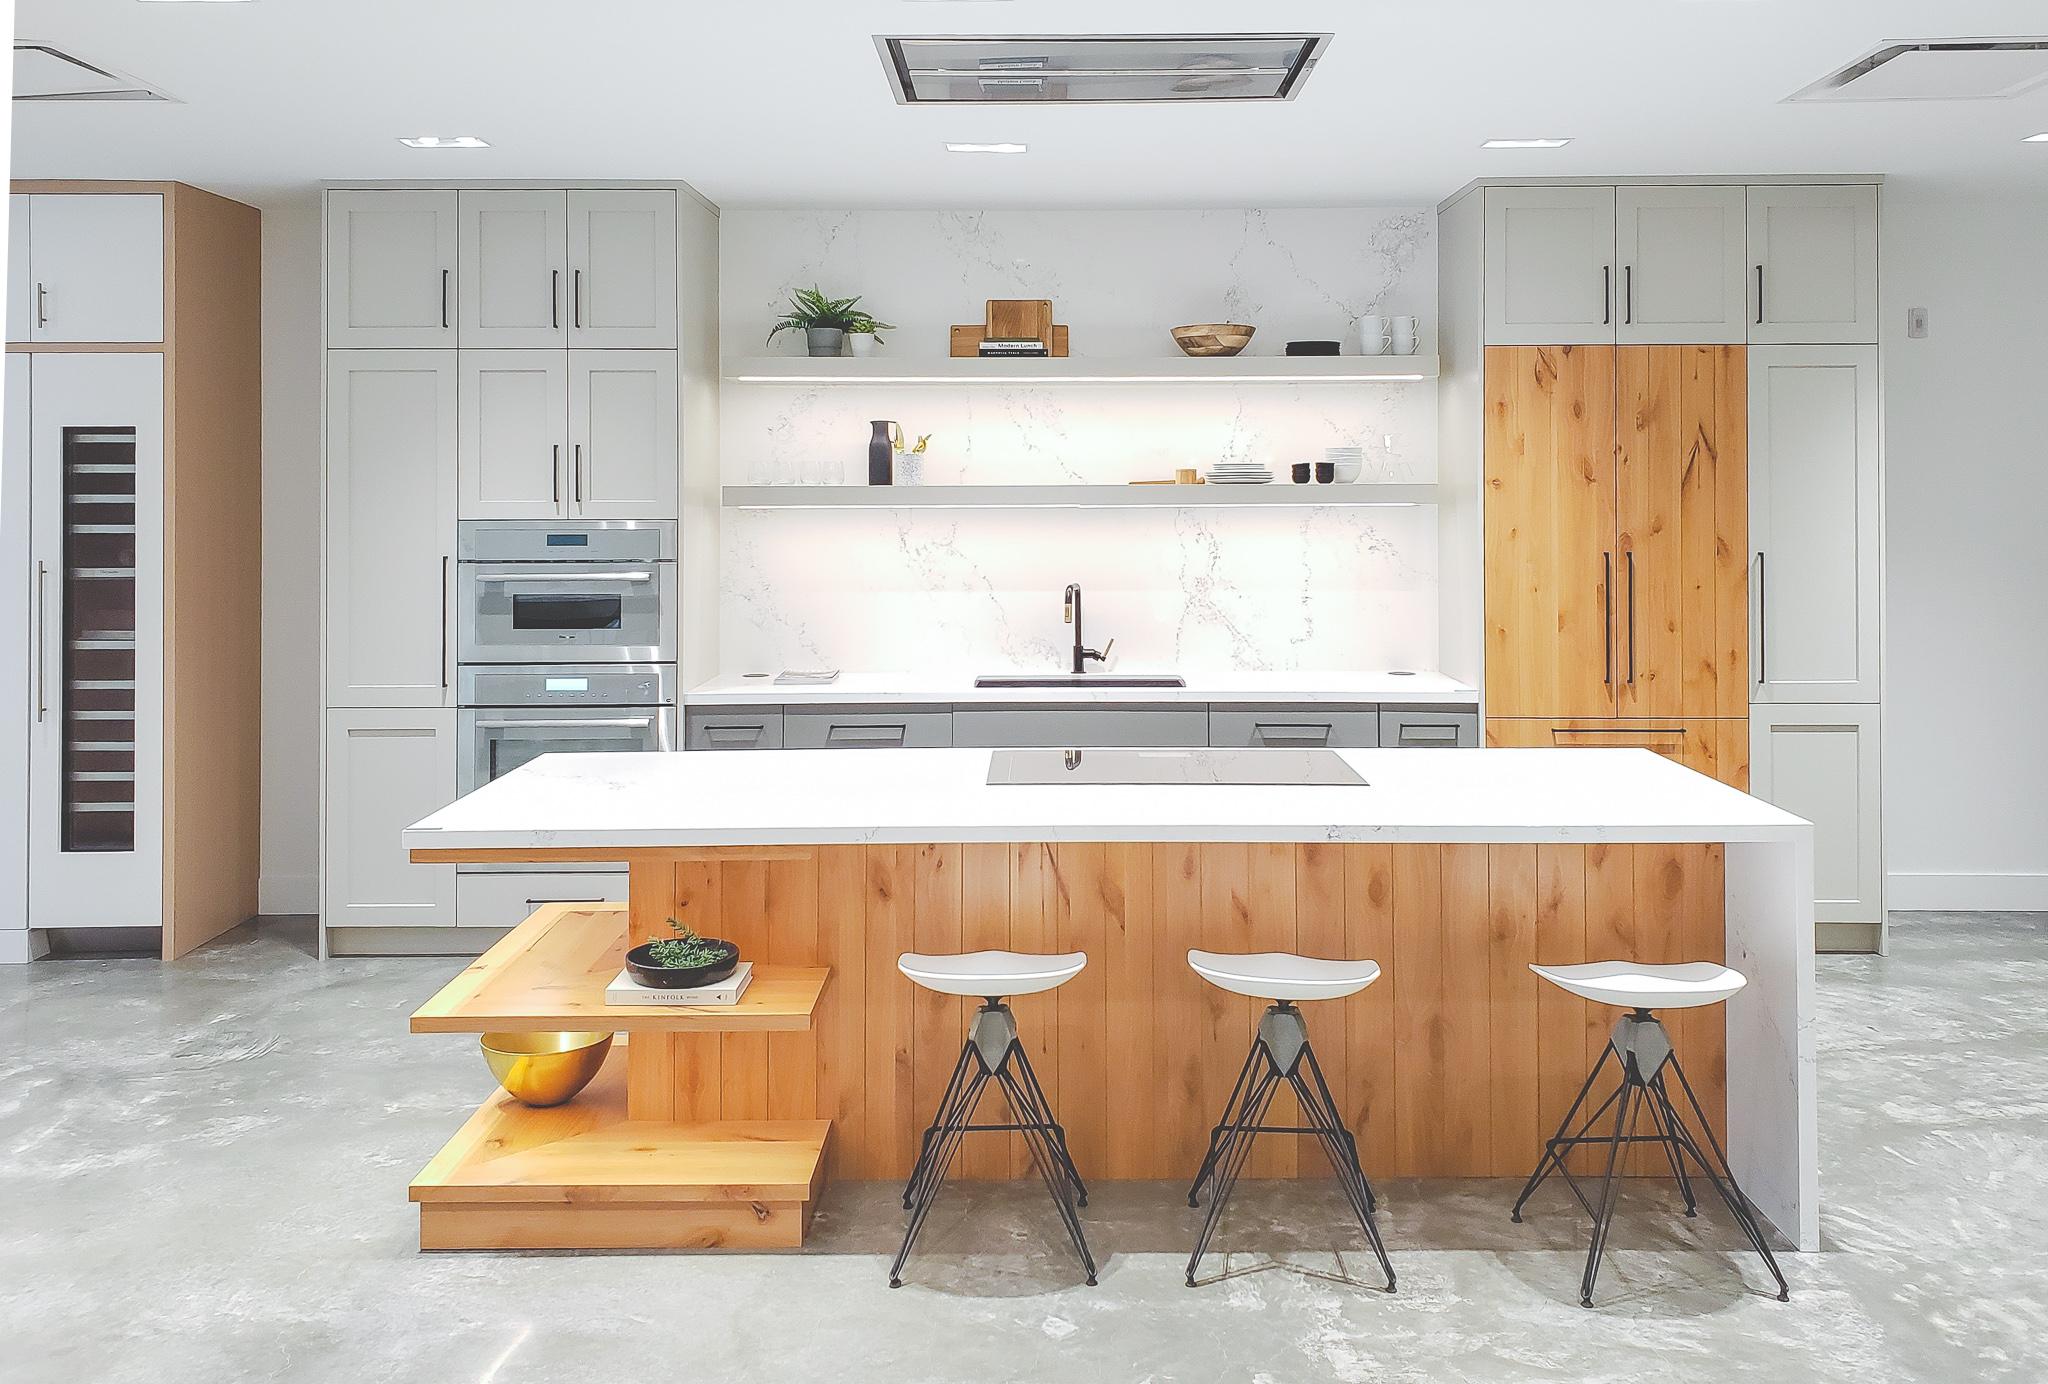 Inspiring Kitchen Design Styles for 2021 4